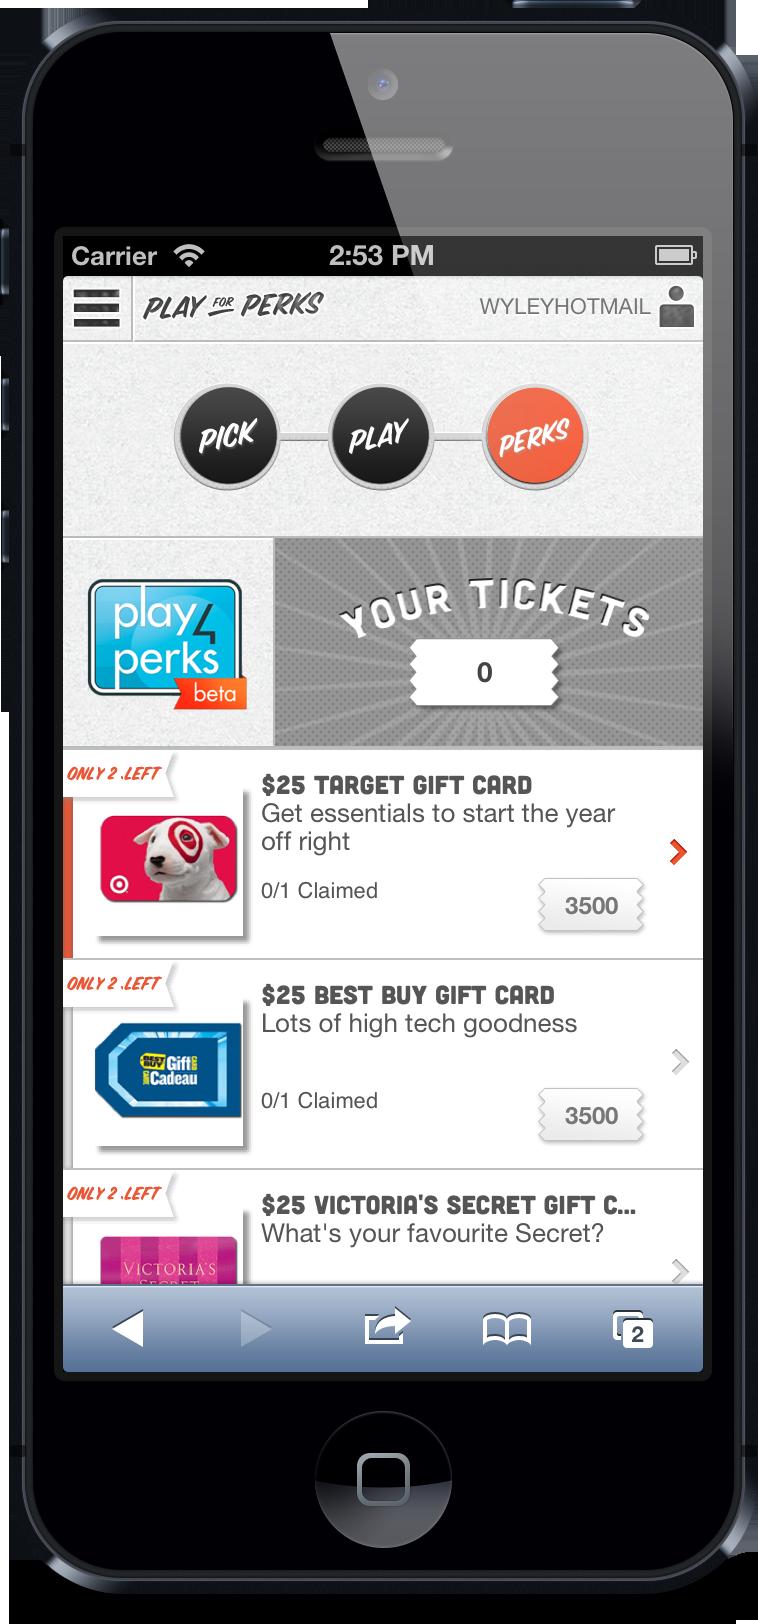 2013-01-23-Play4PerksPerkBrowseScreen.png